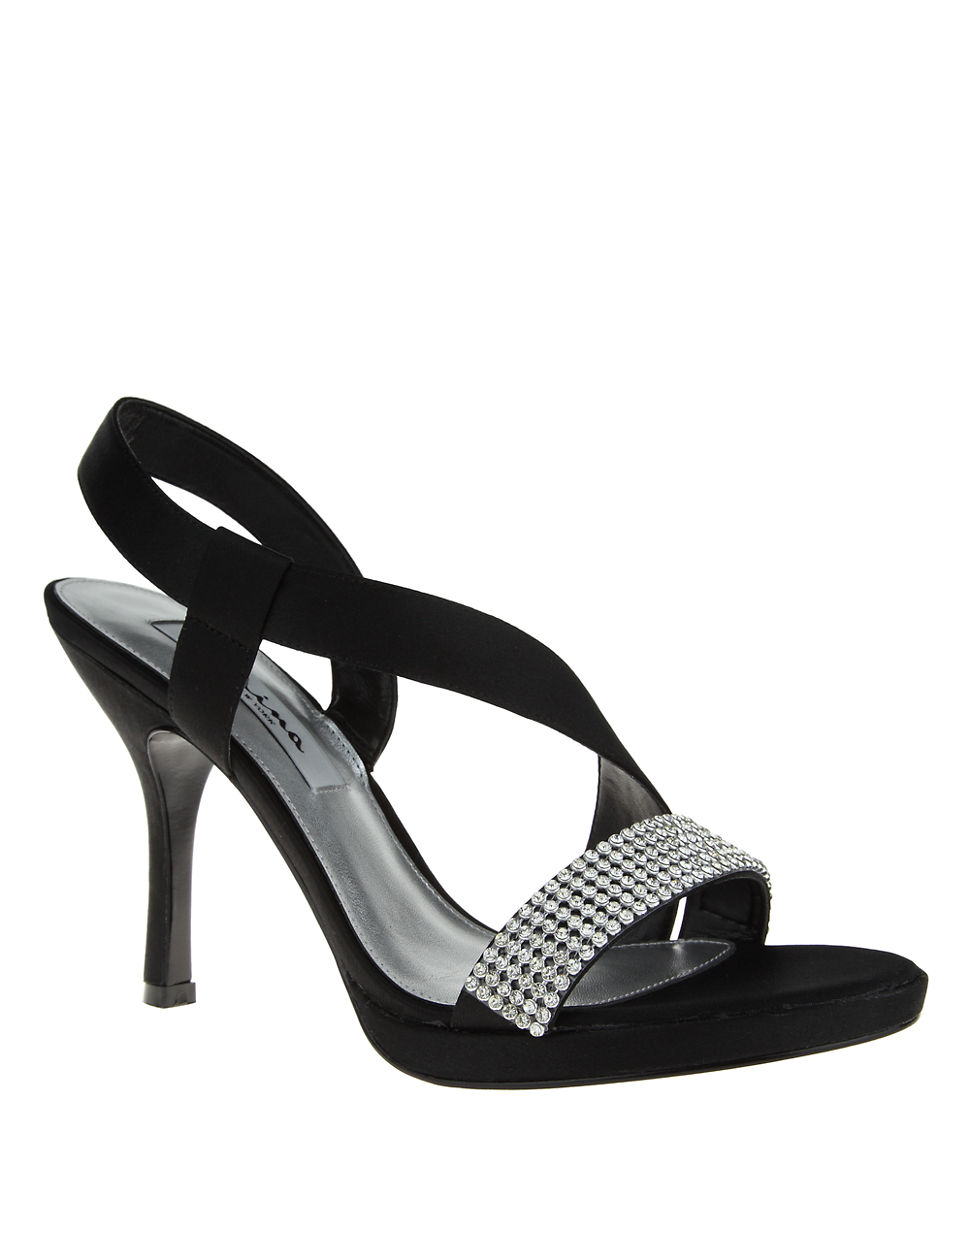 6fa9b6413ebc Lyst - Nina Gloria Satin And Jewel Heels in Black